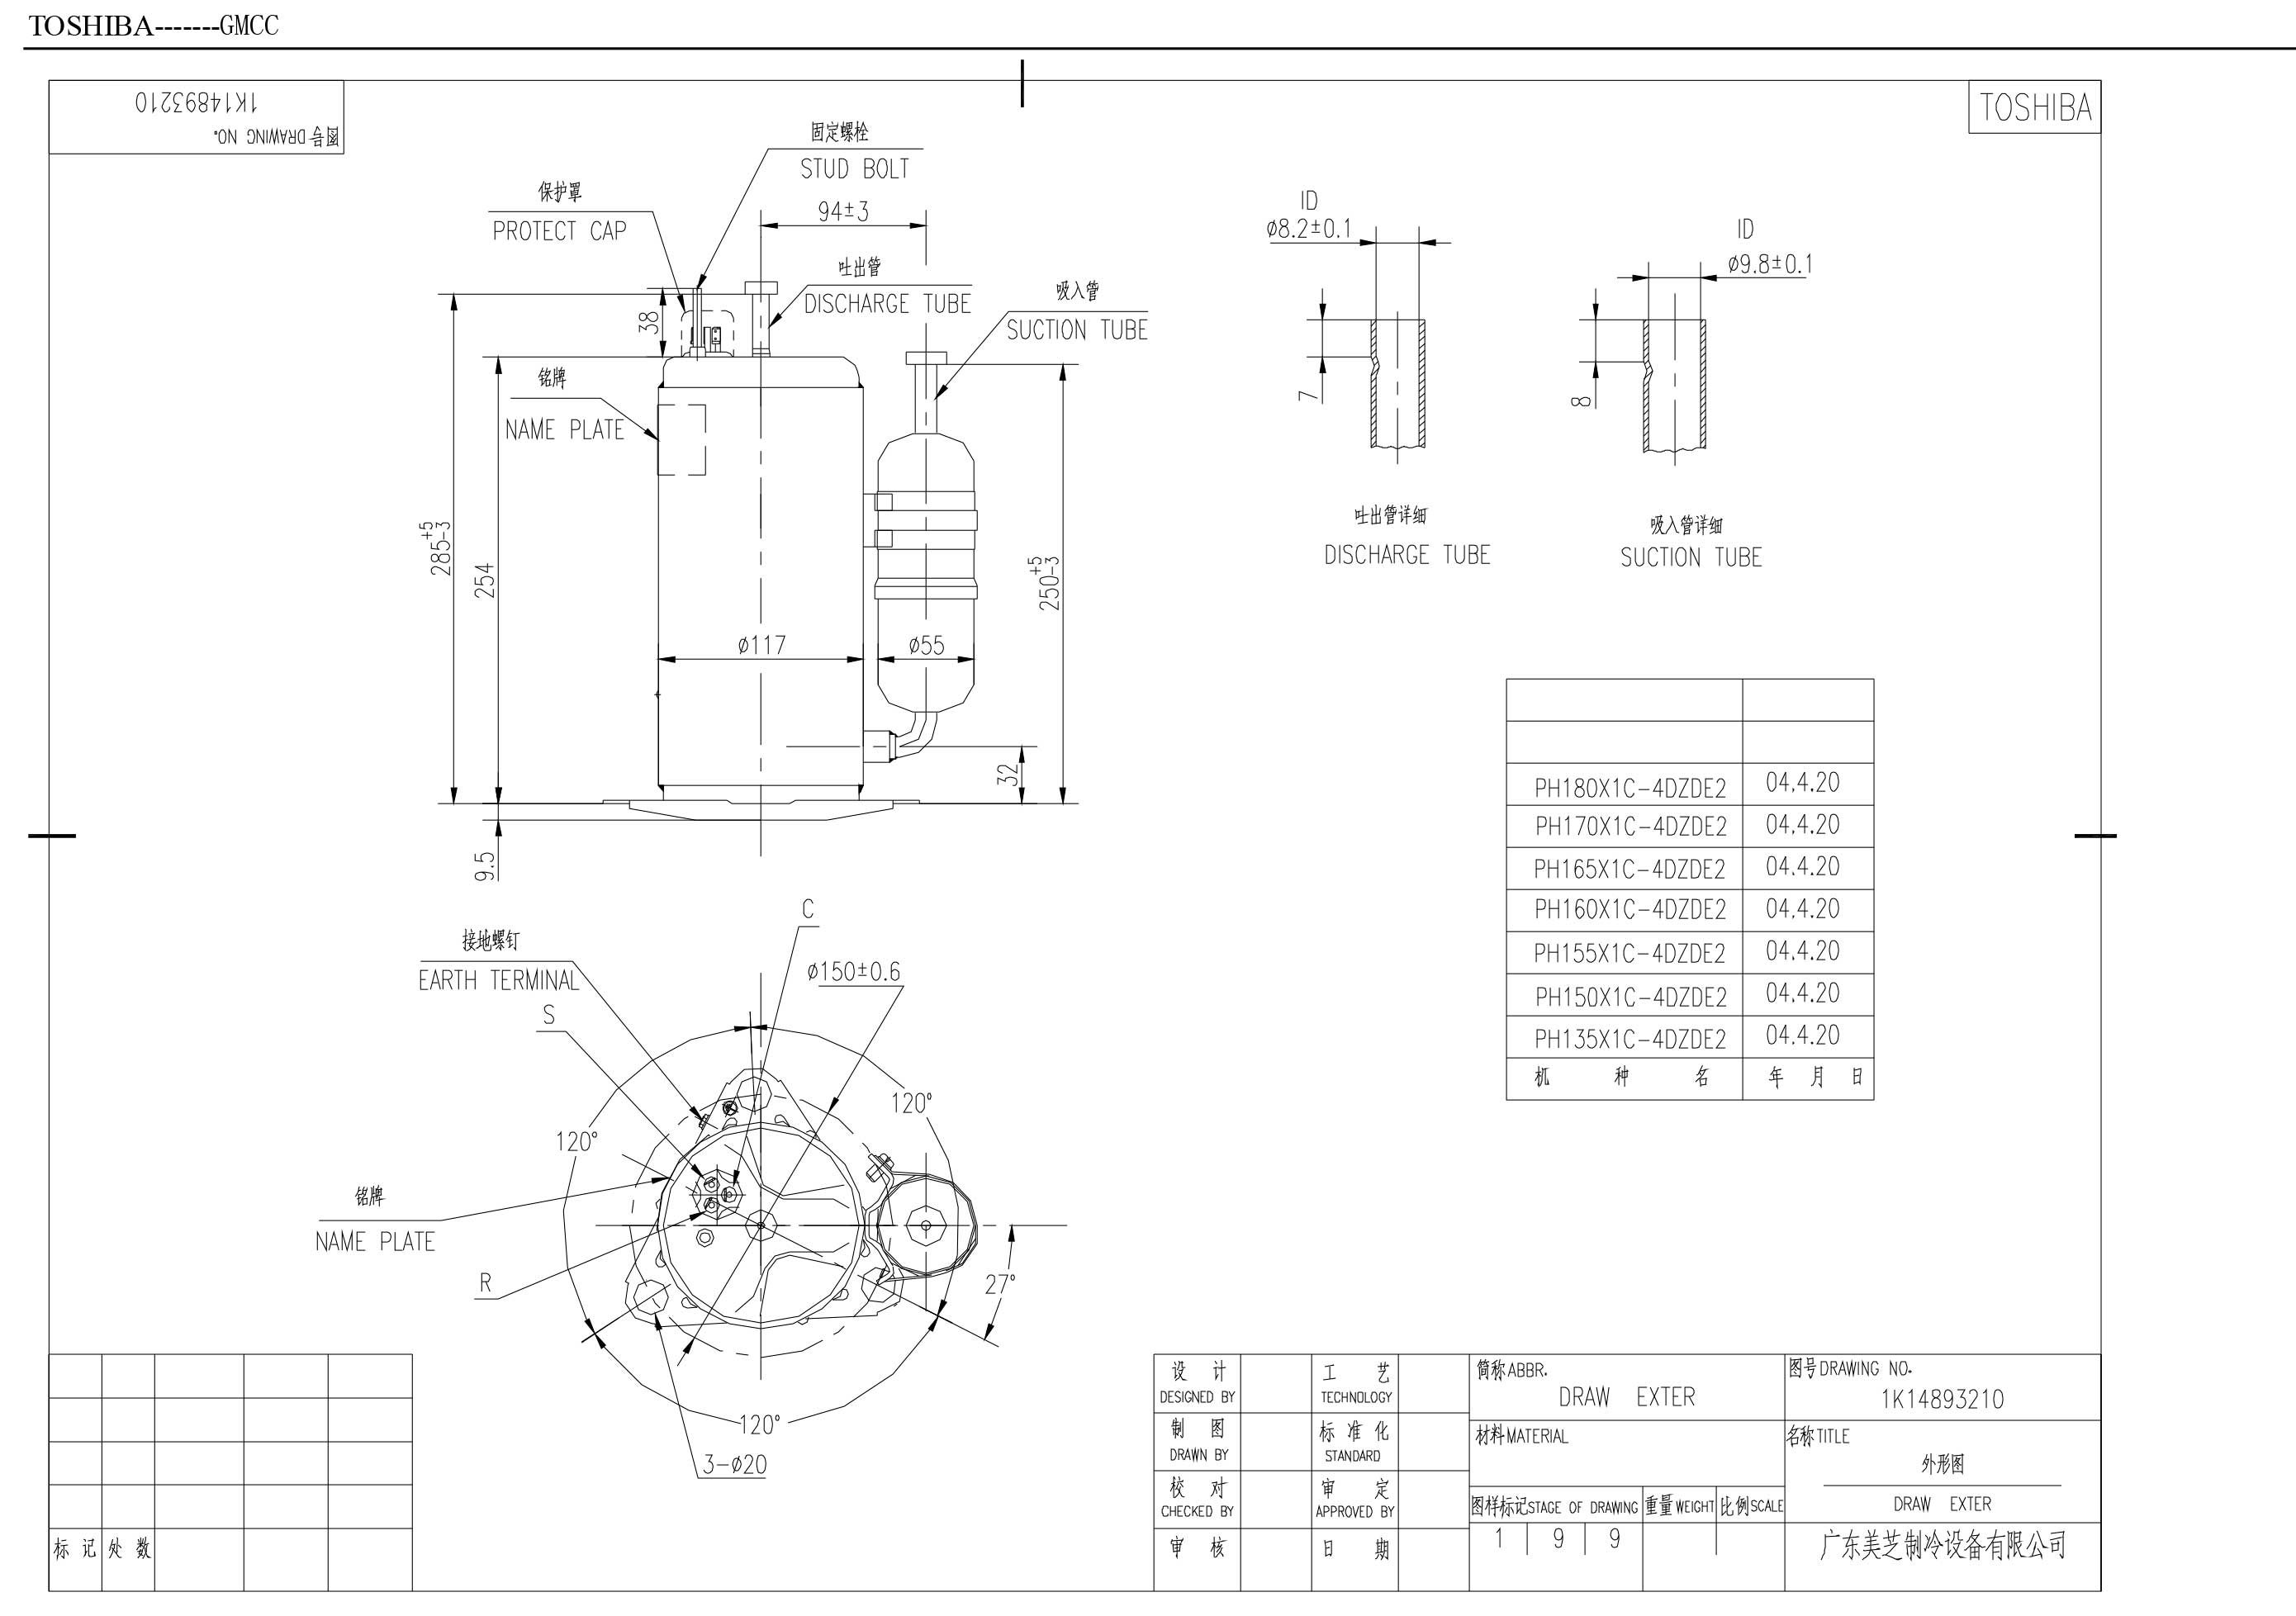 GMCC PH165G1C-4DZDE1 характеристики